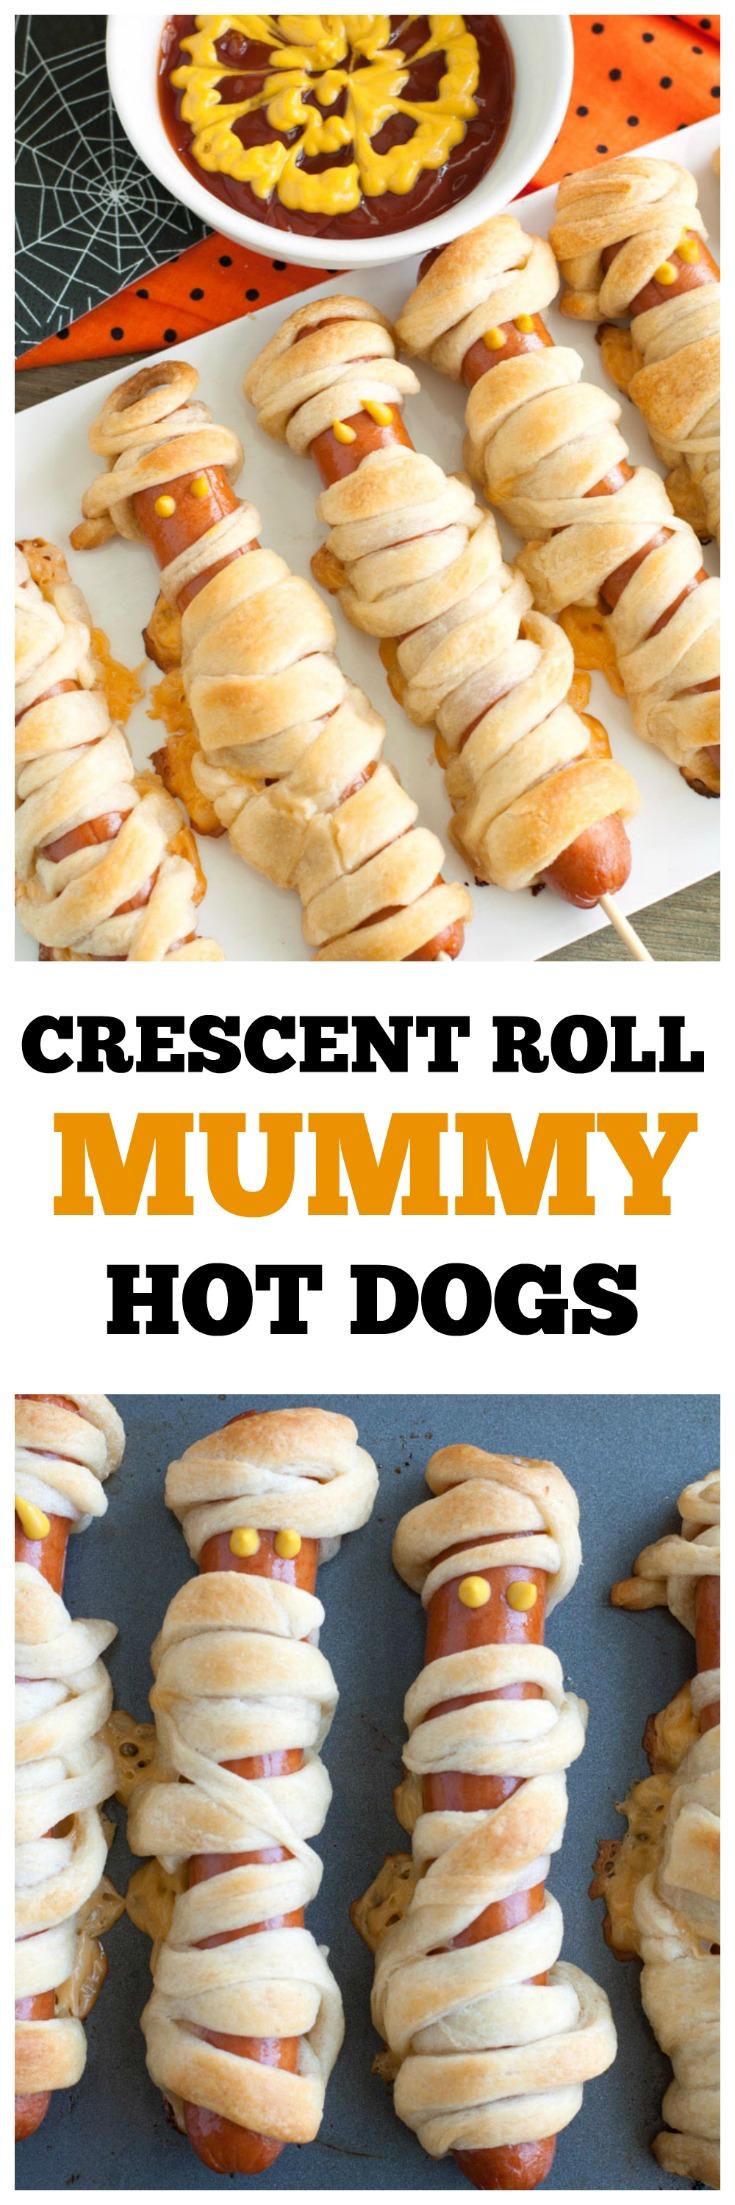 Hot Dog Crescent Roll Bake